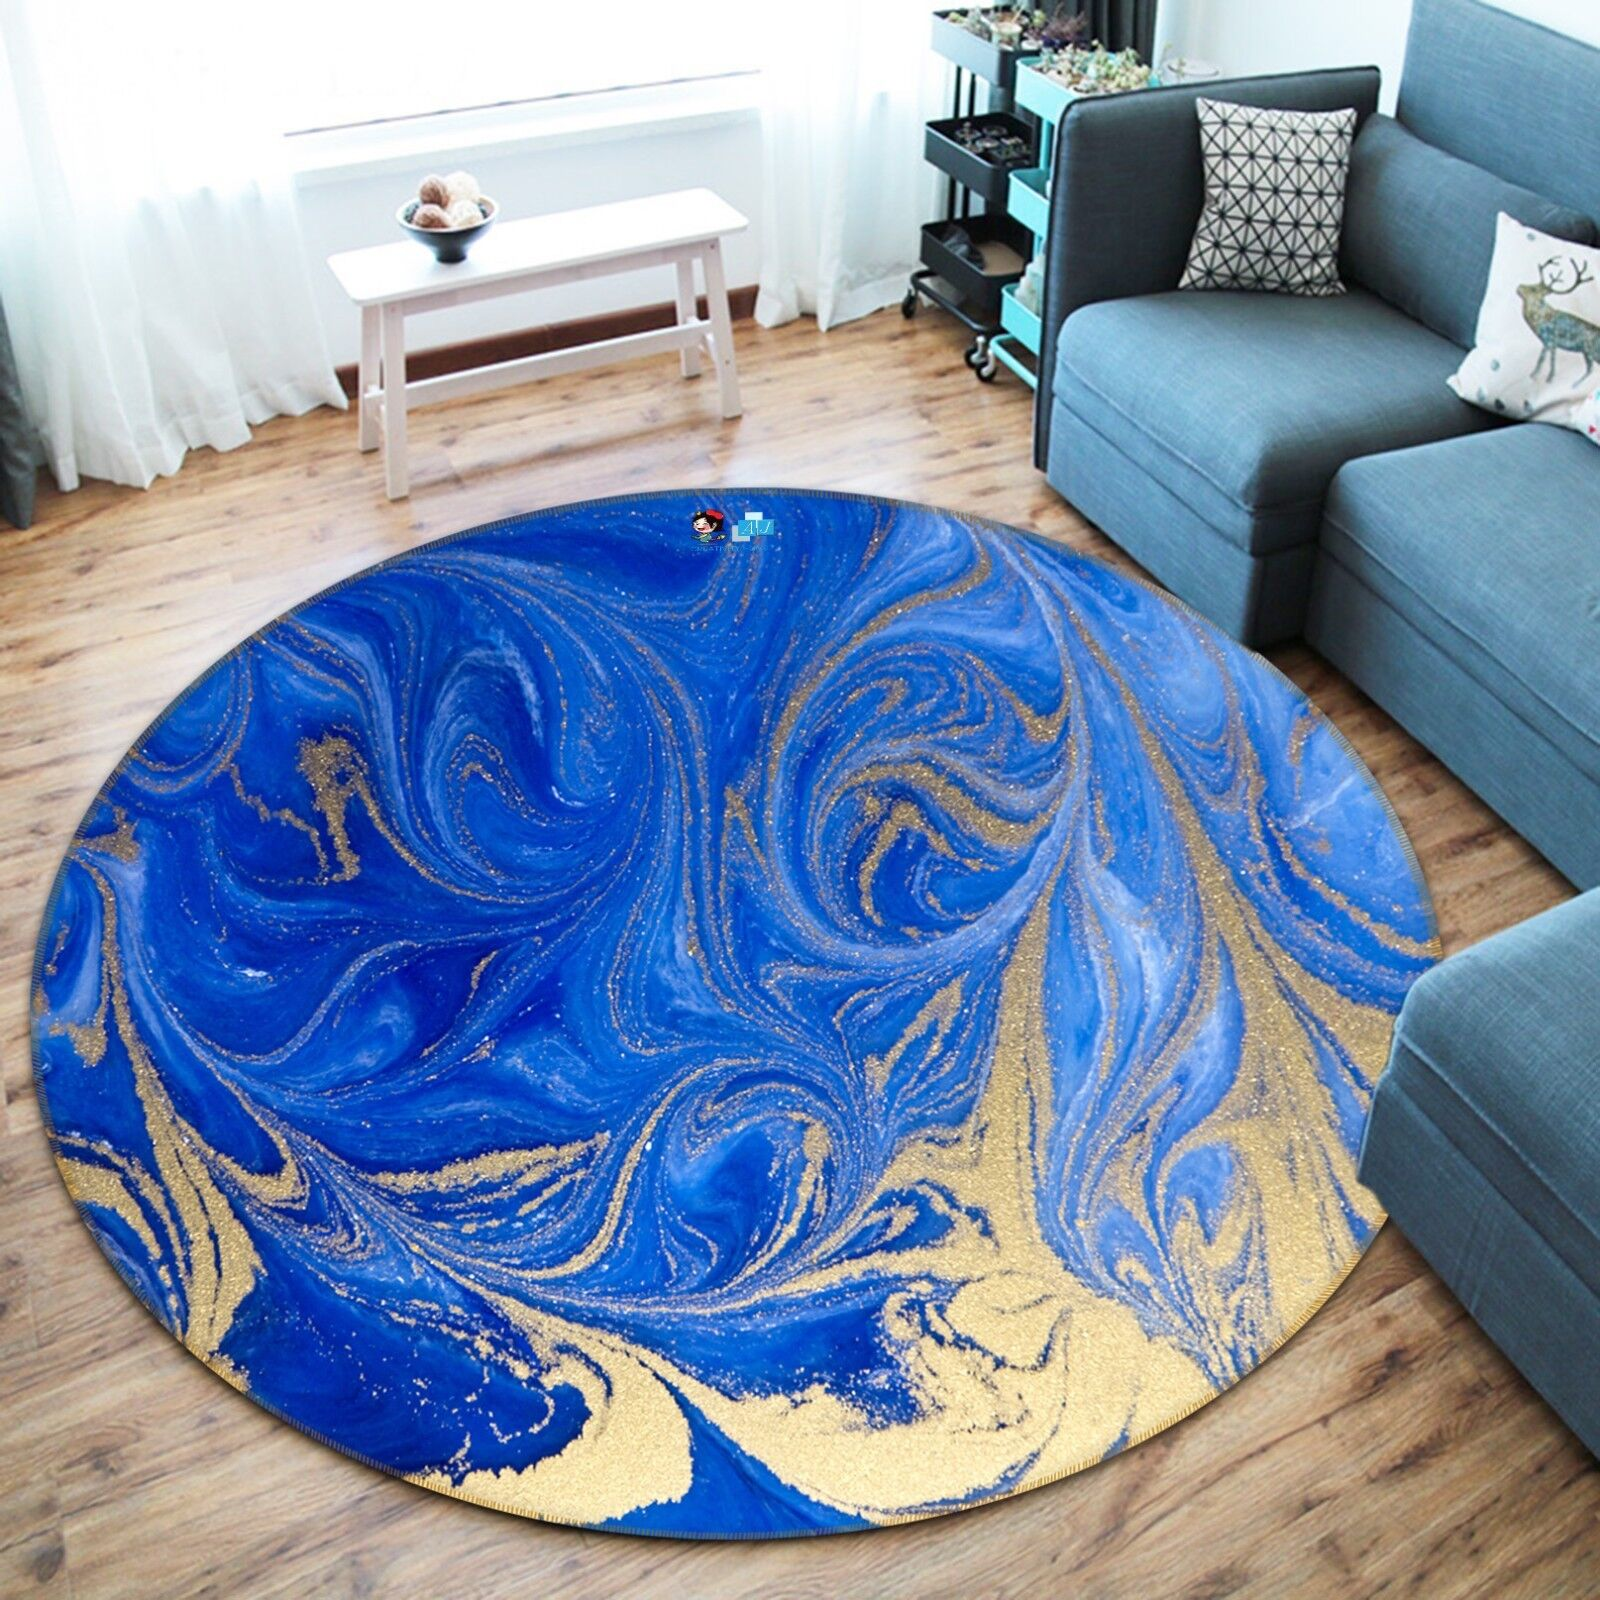 3D Bright Blau Gold Gold Gold 5 Non Slip Rug Room Mat Round Quality Elegant Photo Carpet 7c593f